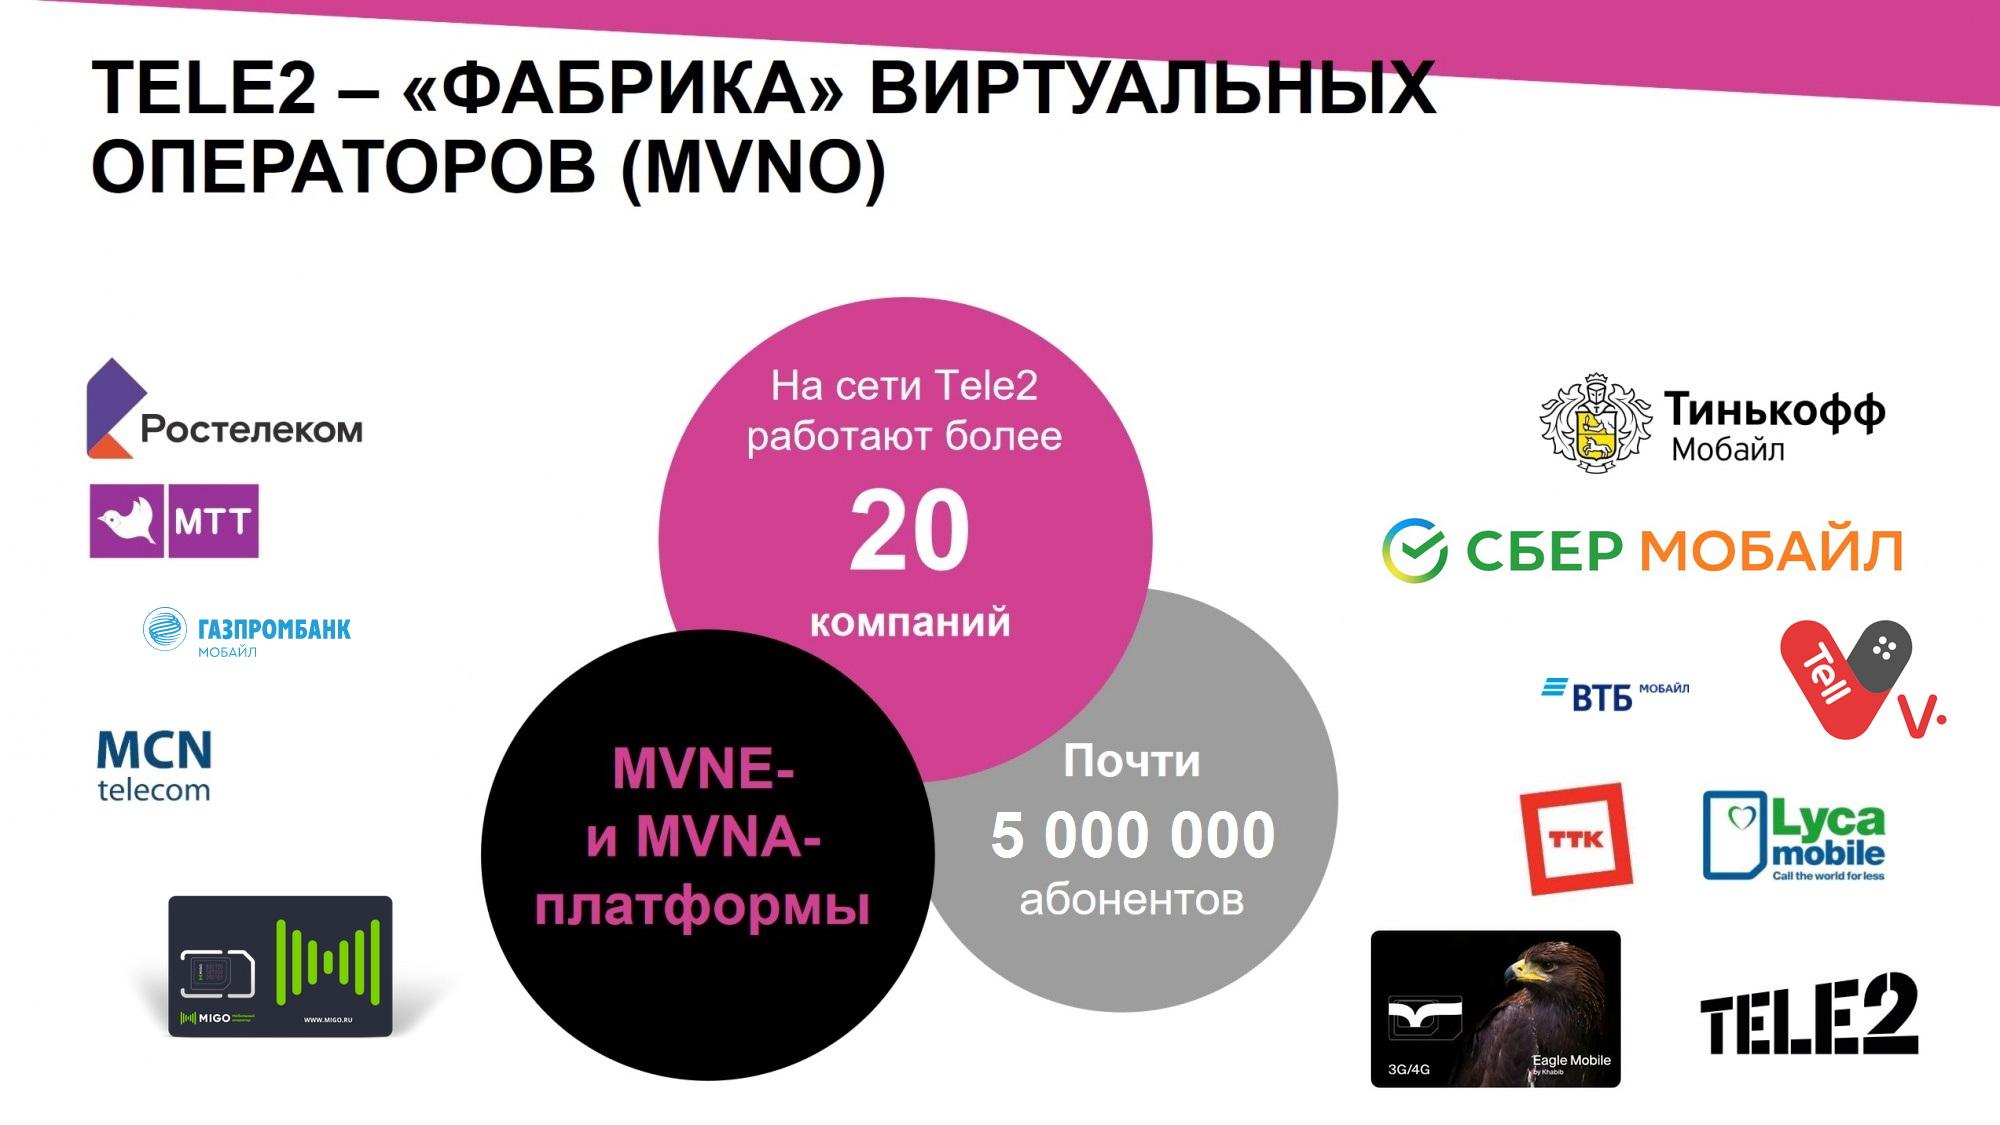 Виртуальные операторы Tele2 нарастили абонентскую базу на 28% 1